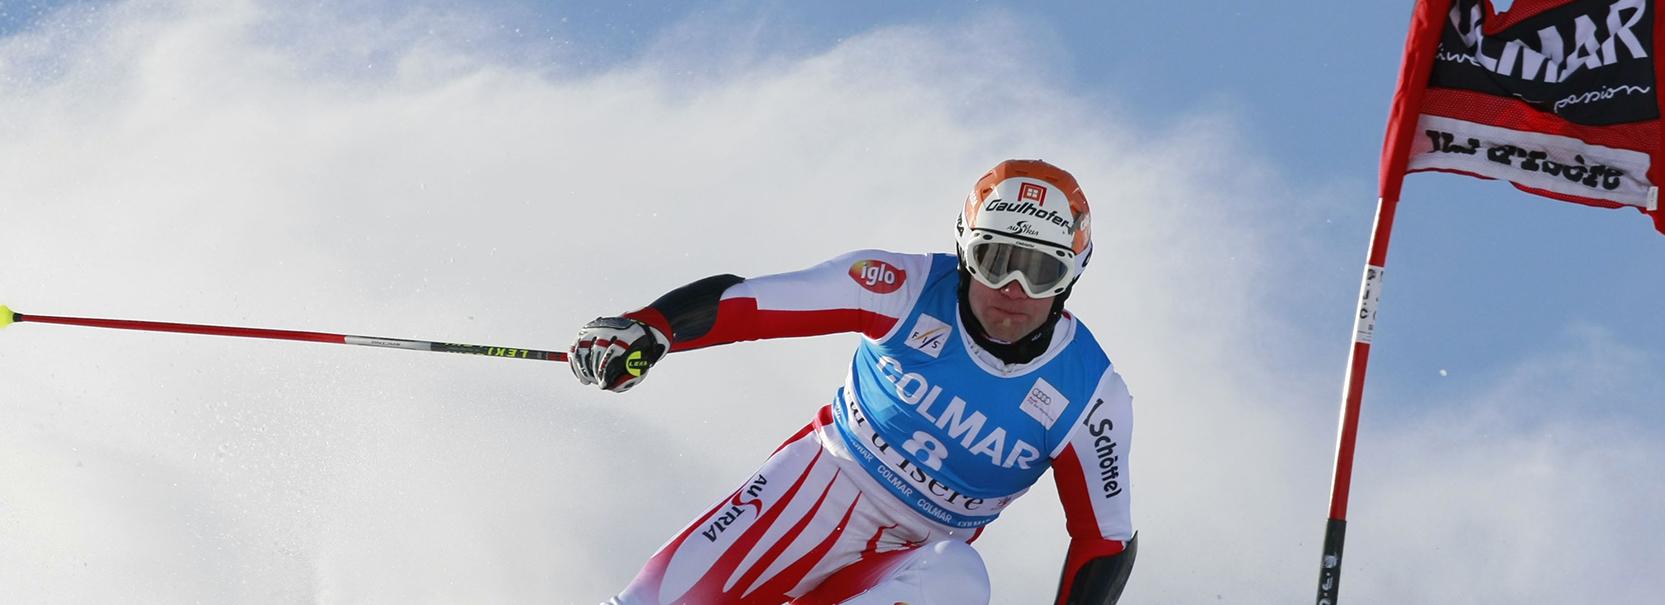 Slalom_4